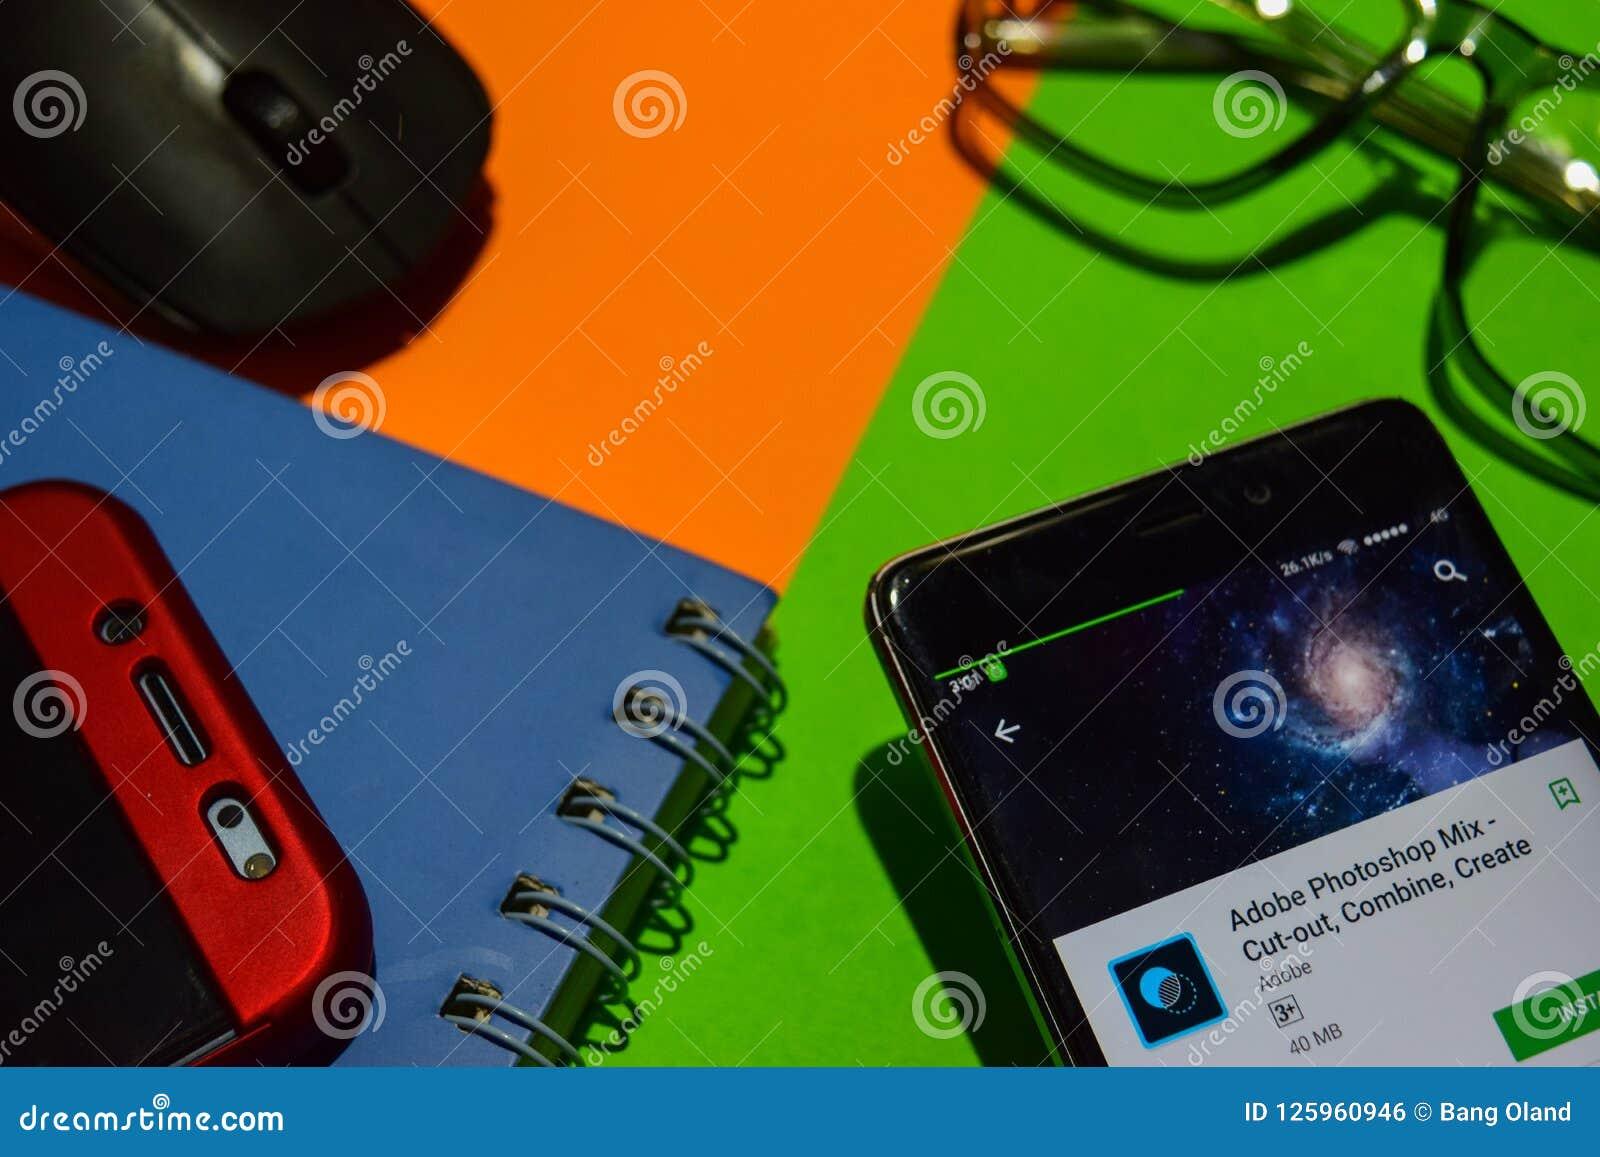 Adobe Photoshop Mix - Cut-out, Combine, Create Dev App On